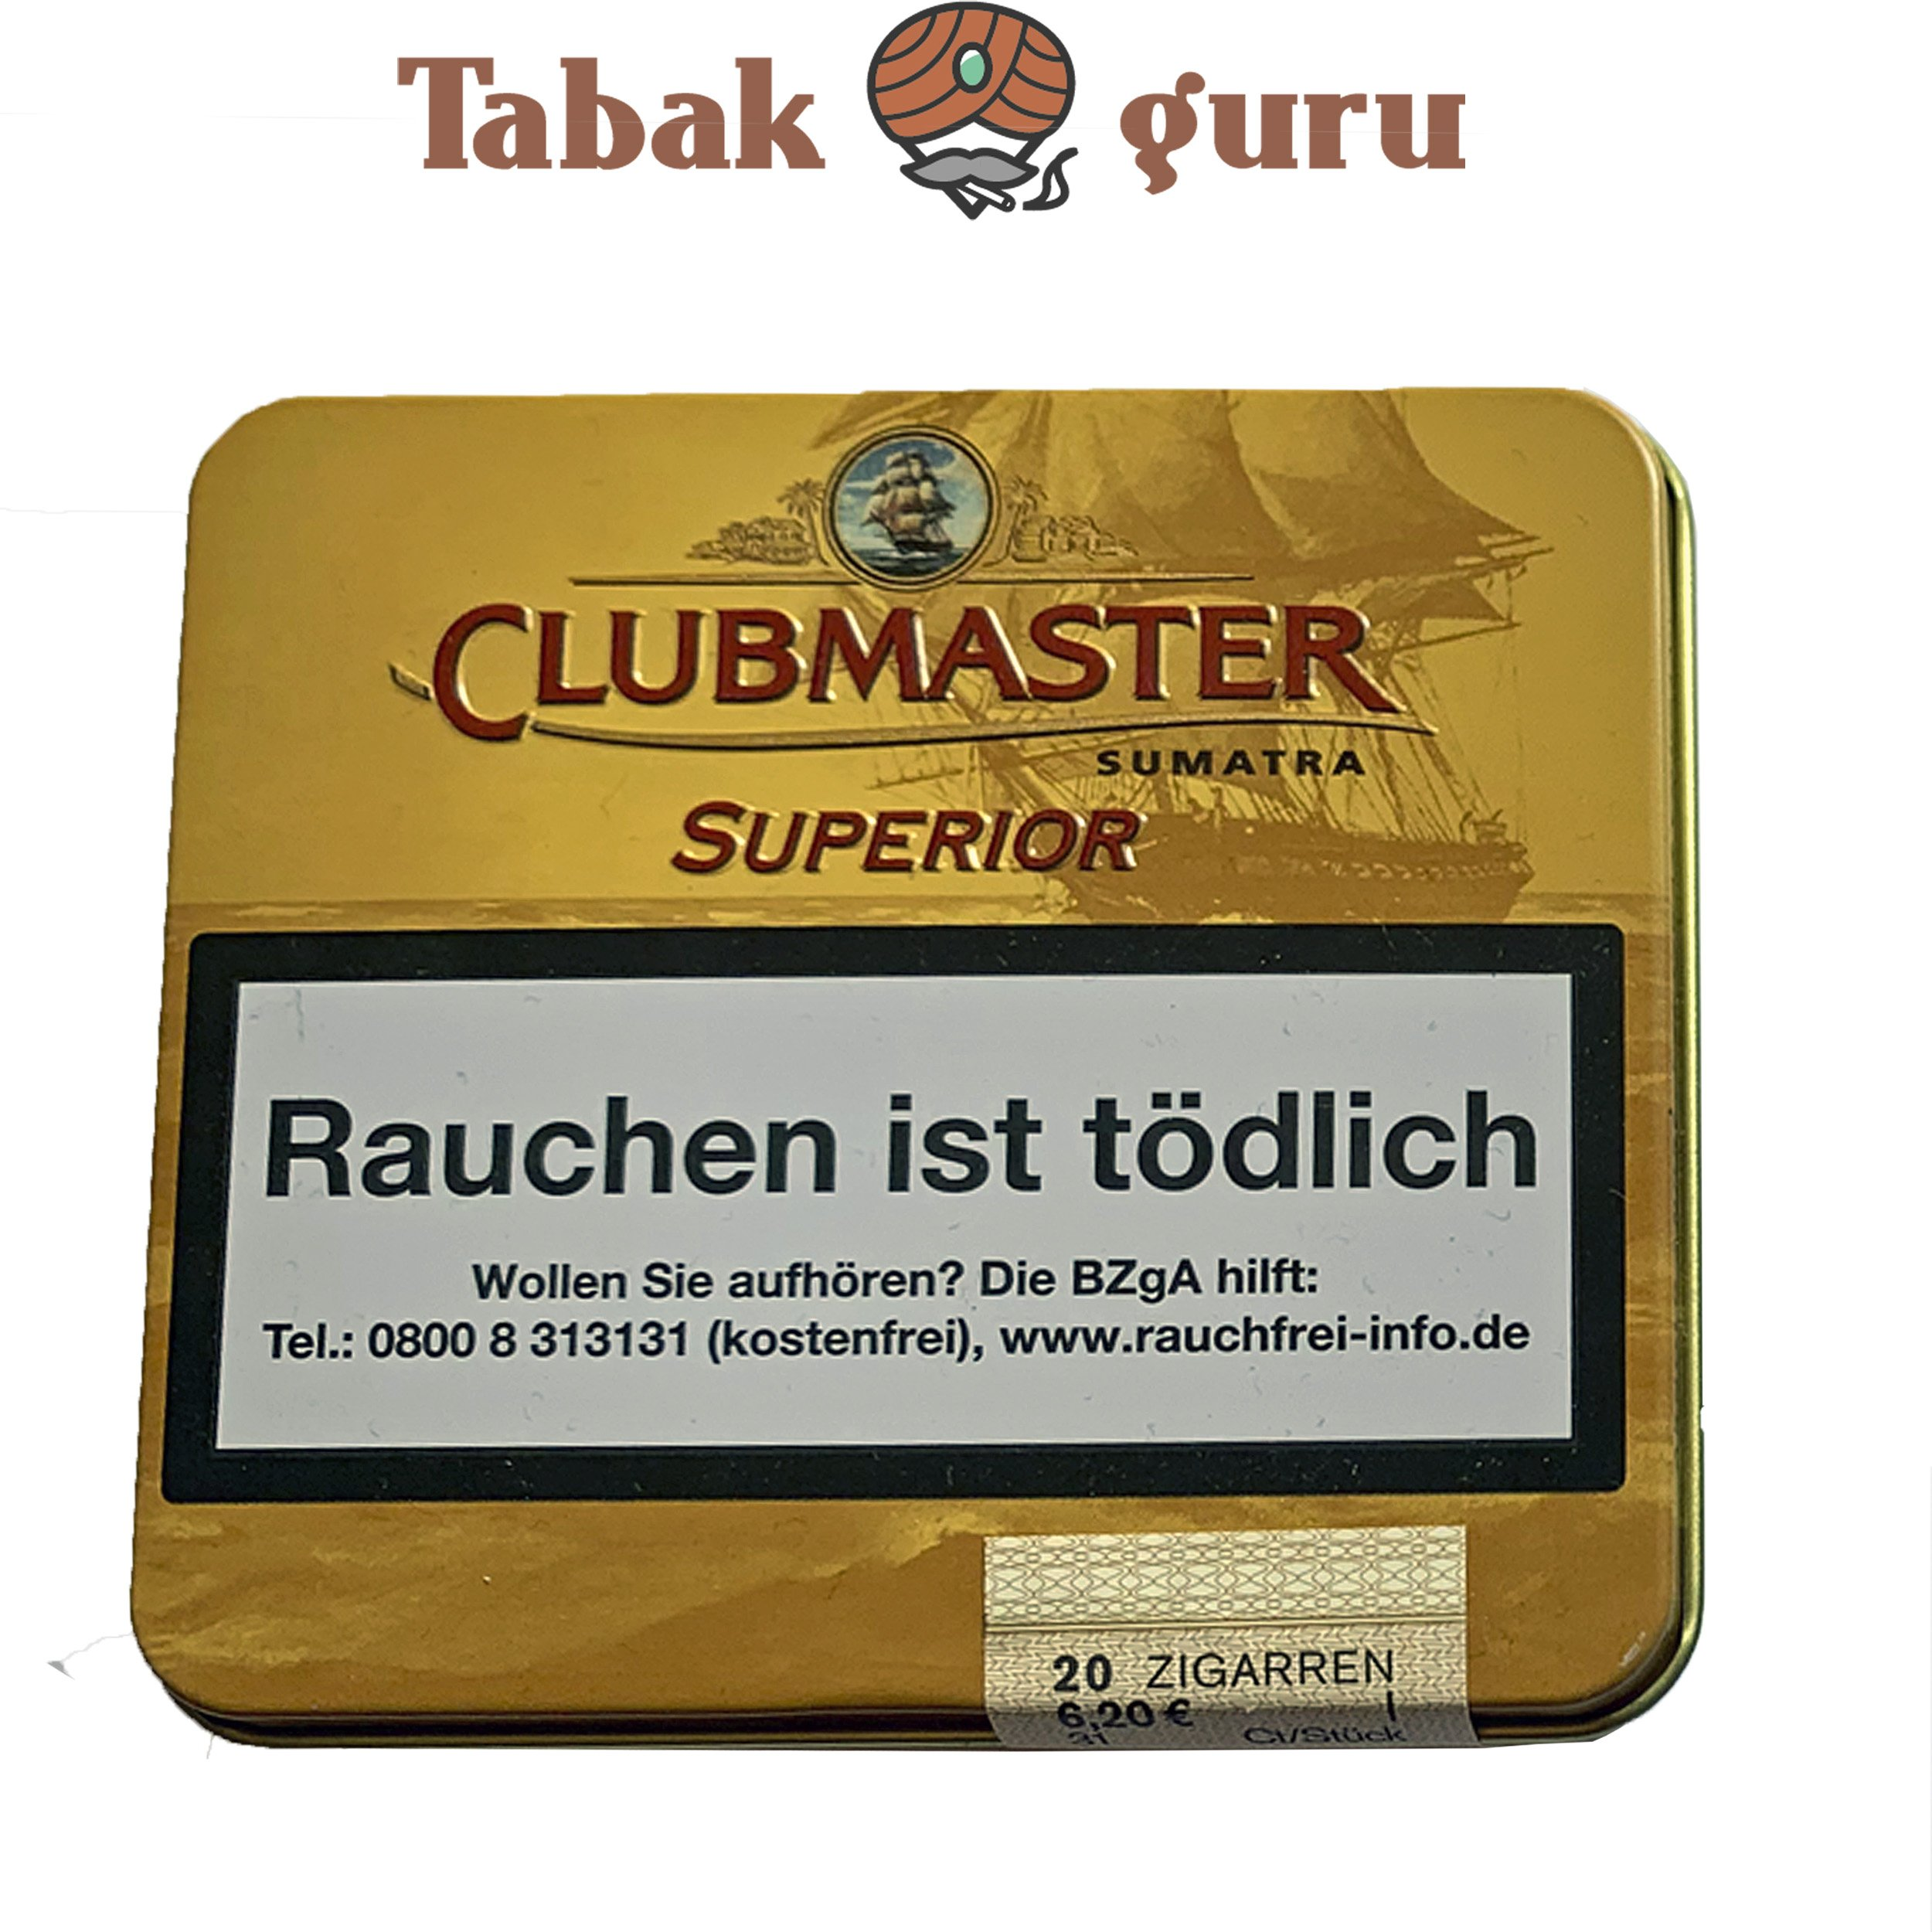 Clubmaster Superior Sumatra Nr 141